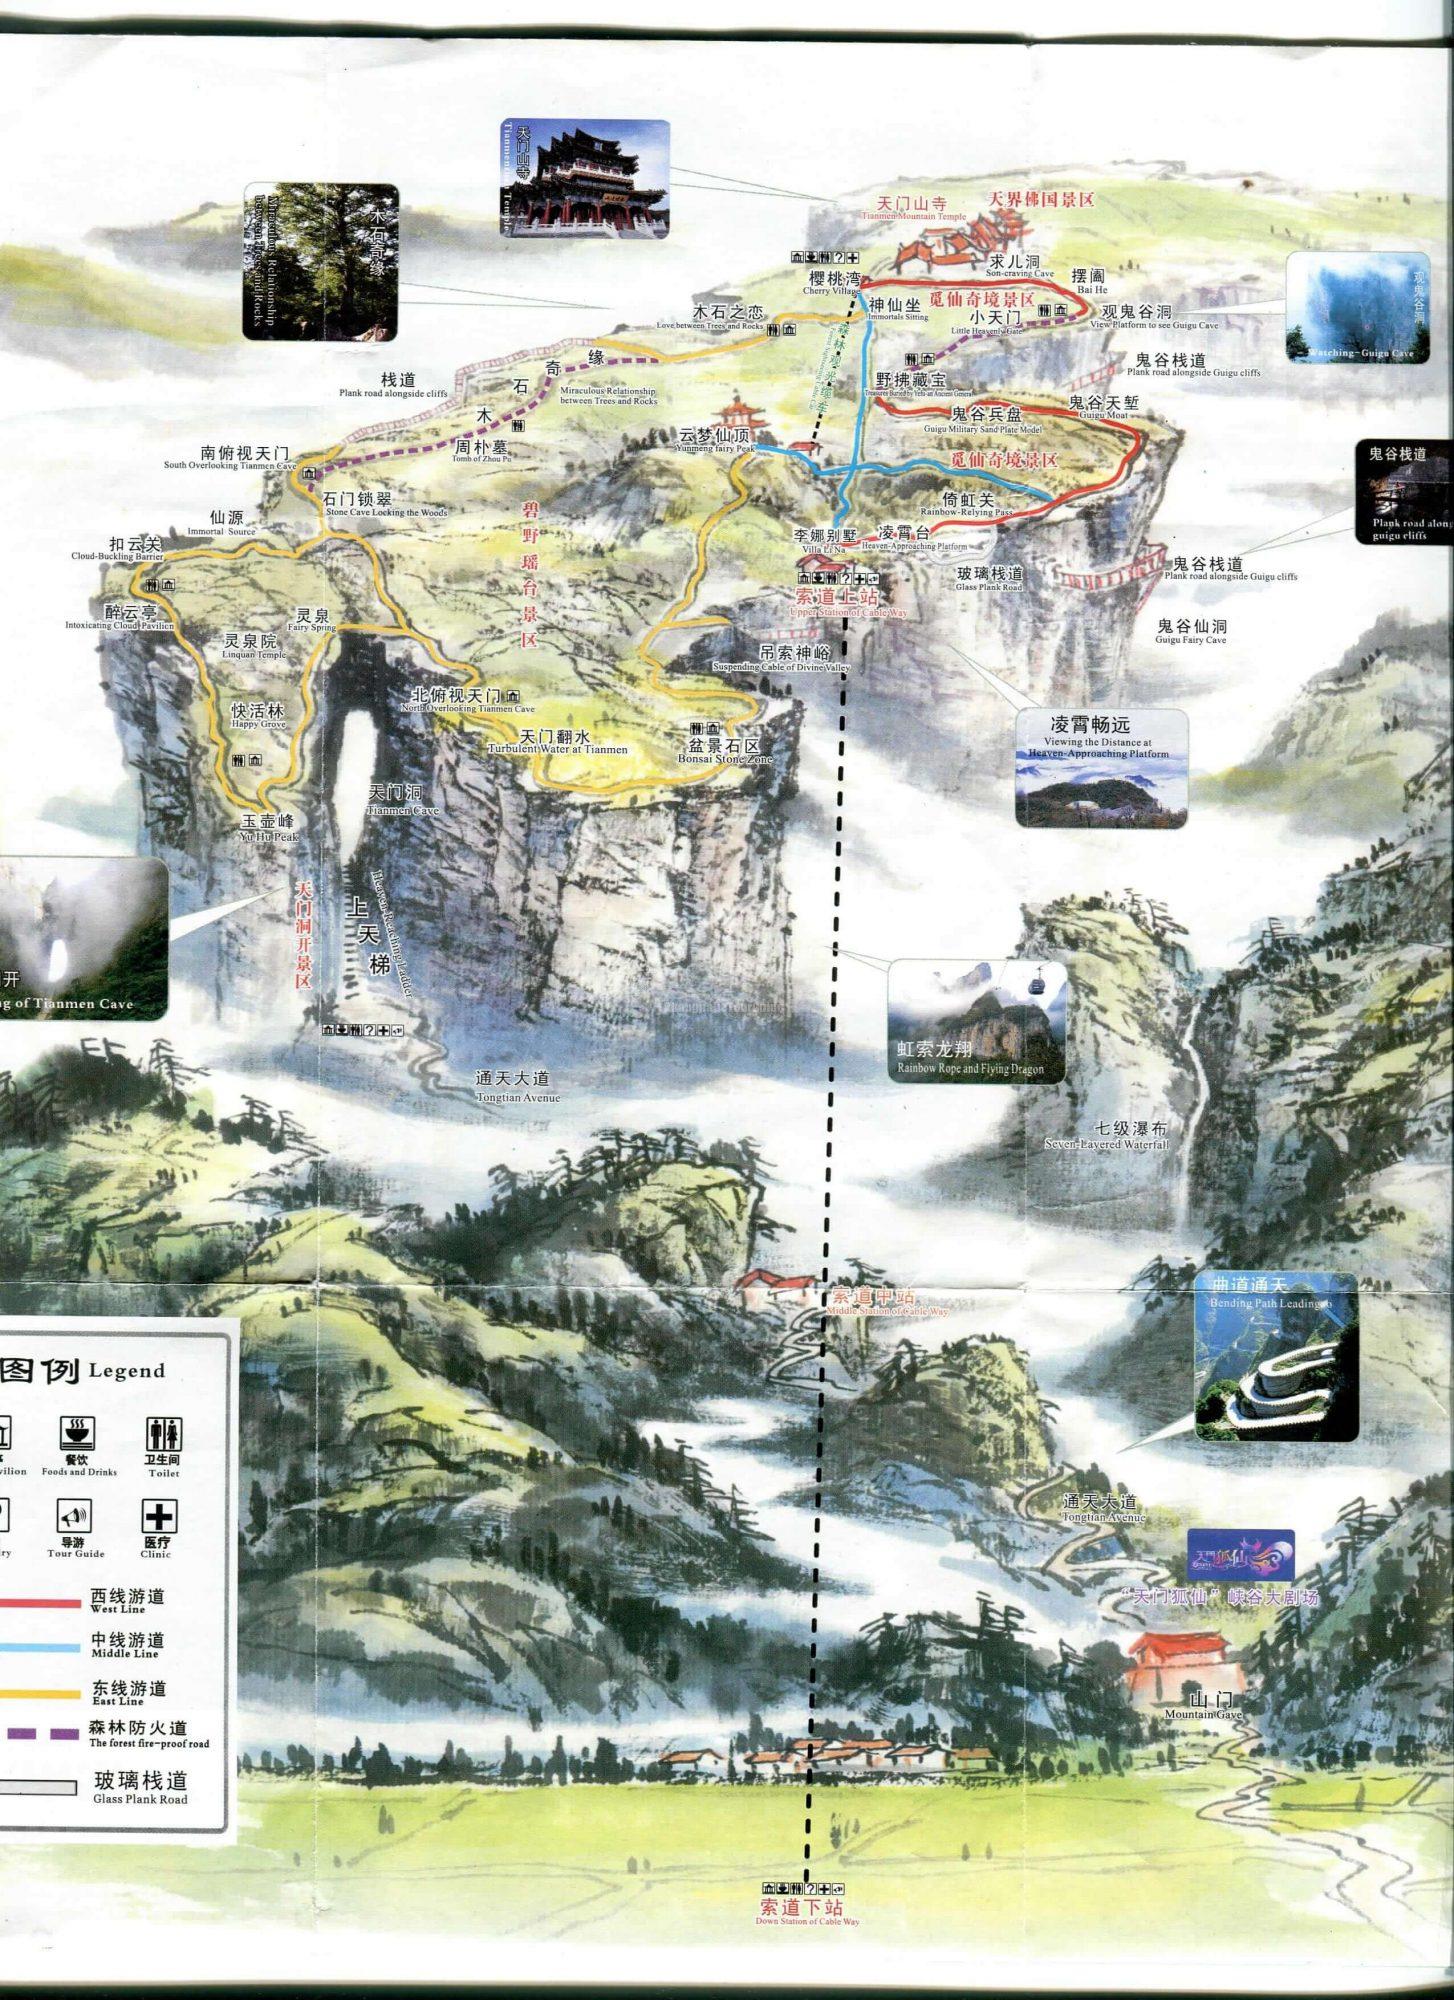 mount tianmen tour map